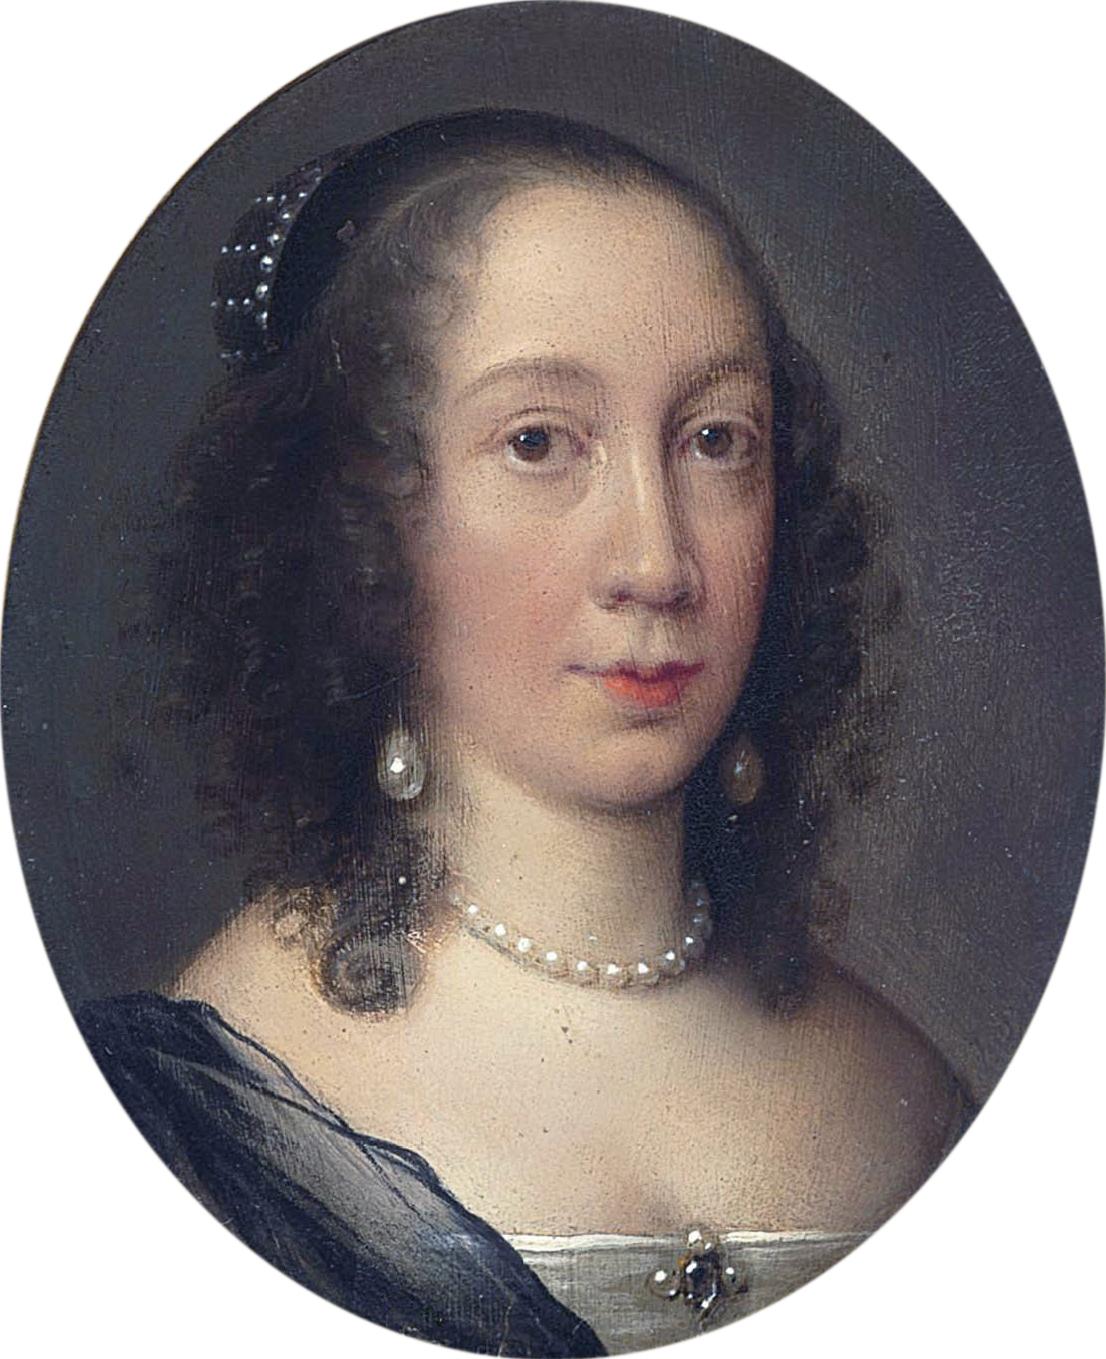 https://upload.wikimedia.org/wikipedia/commons/2/25/Lady_Pakington%2C_n%C3%A9e_Dorothy_Coventry_%281623-1679%29_by_Cornelis_Jonson_van_Ceulen_%281593-1661%29.jpg